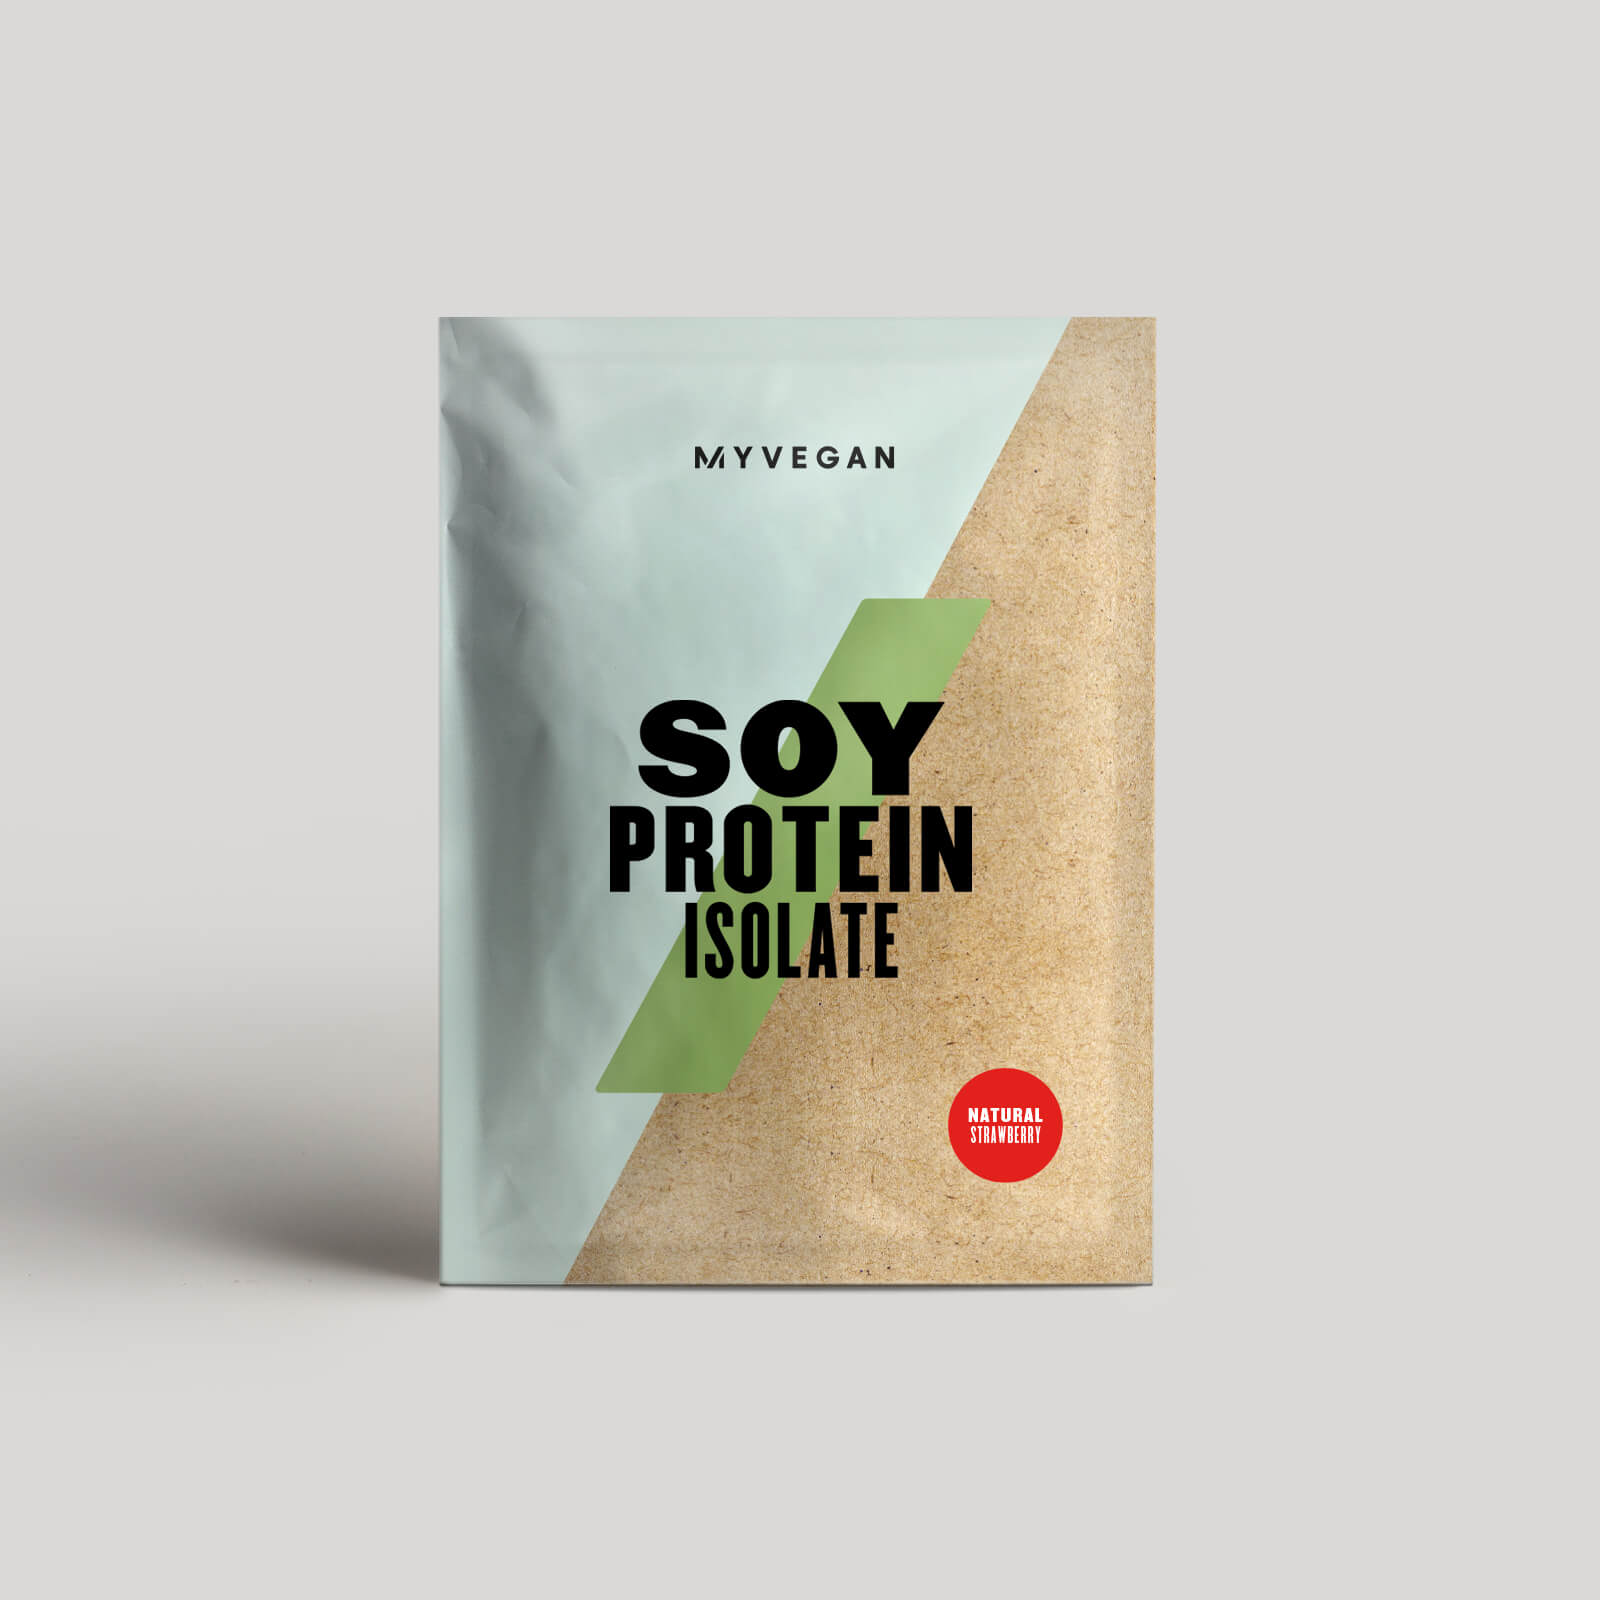 Isolat de protéine de soja (Énchantillon) - 30g - Fraise Naturelle